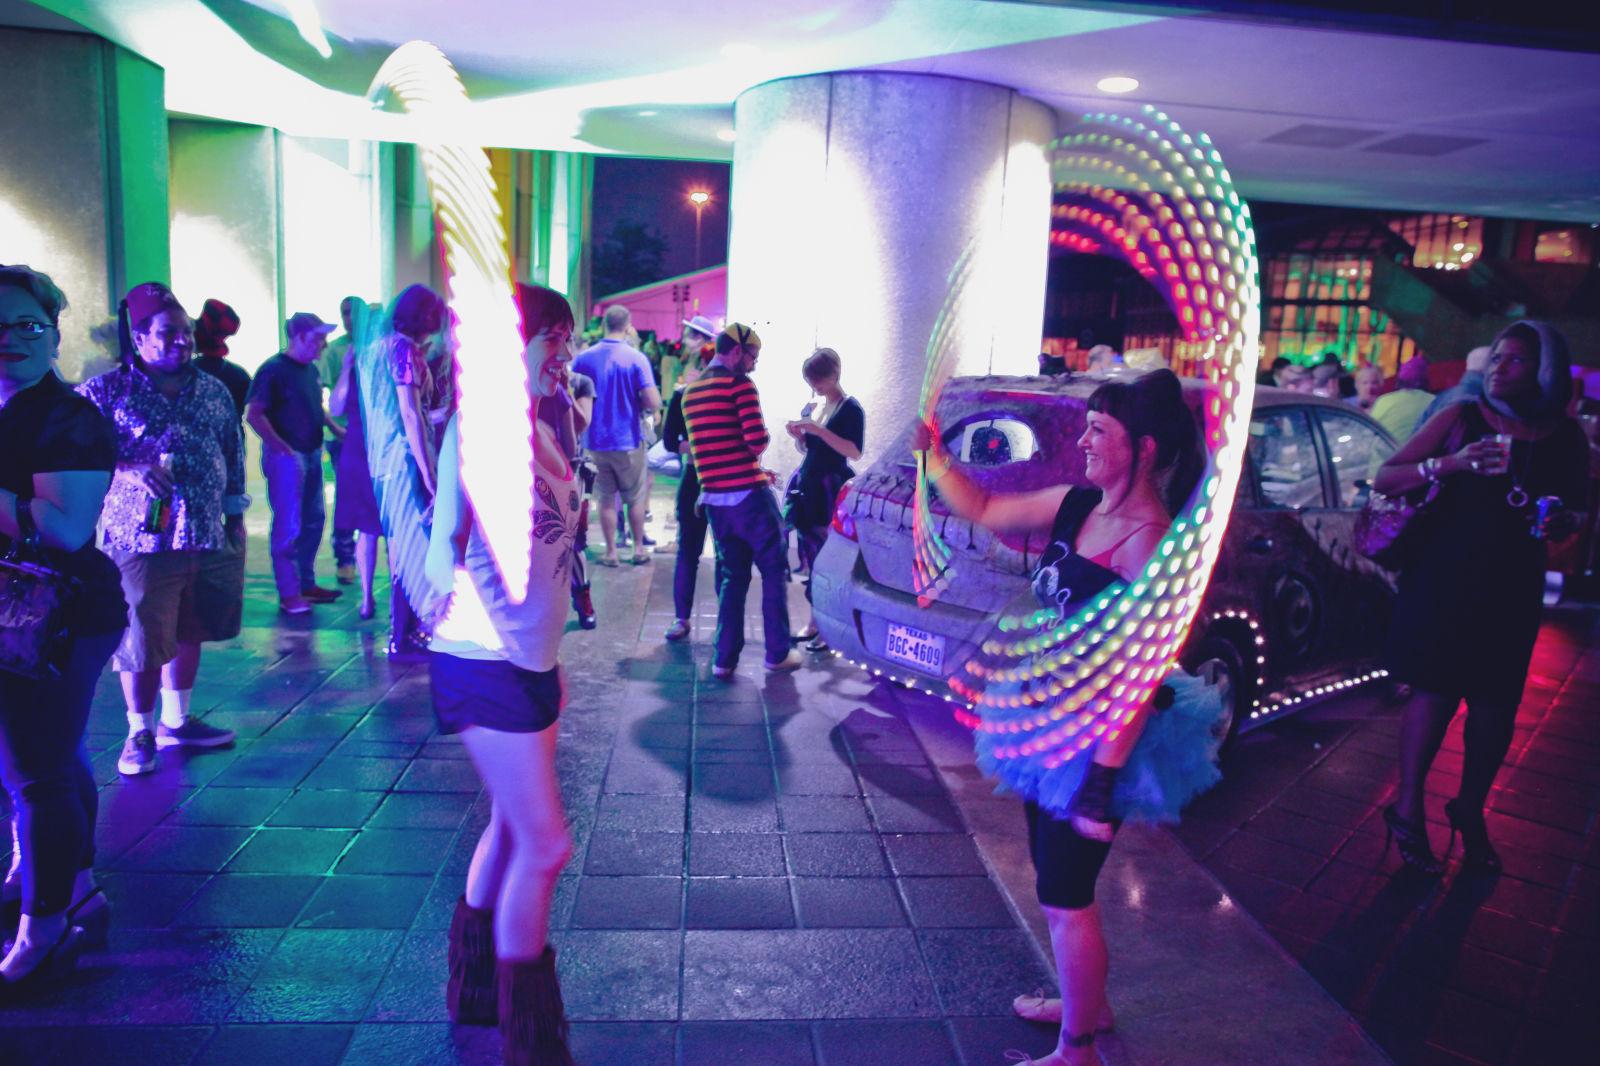 Hula hoopers at the art car ball m1vdne